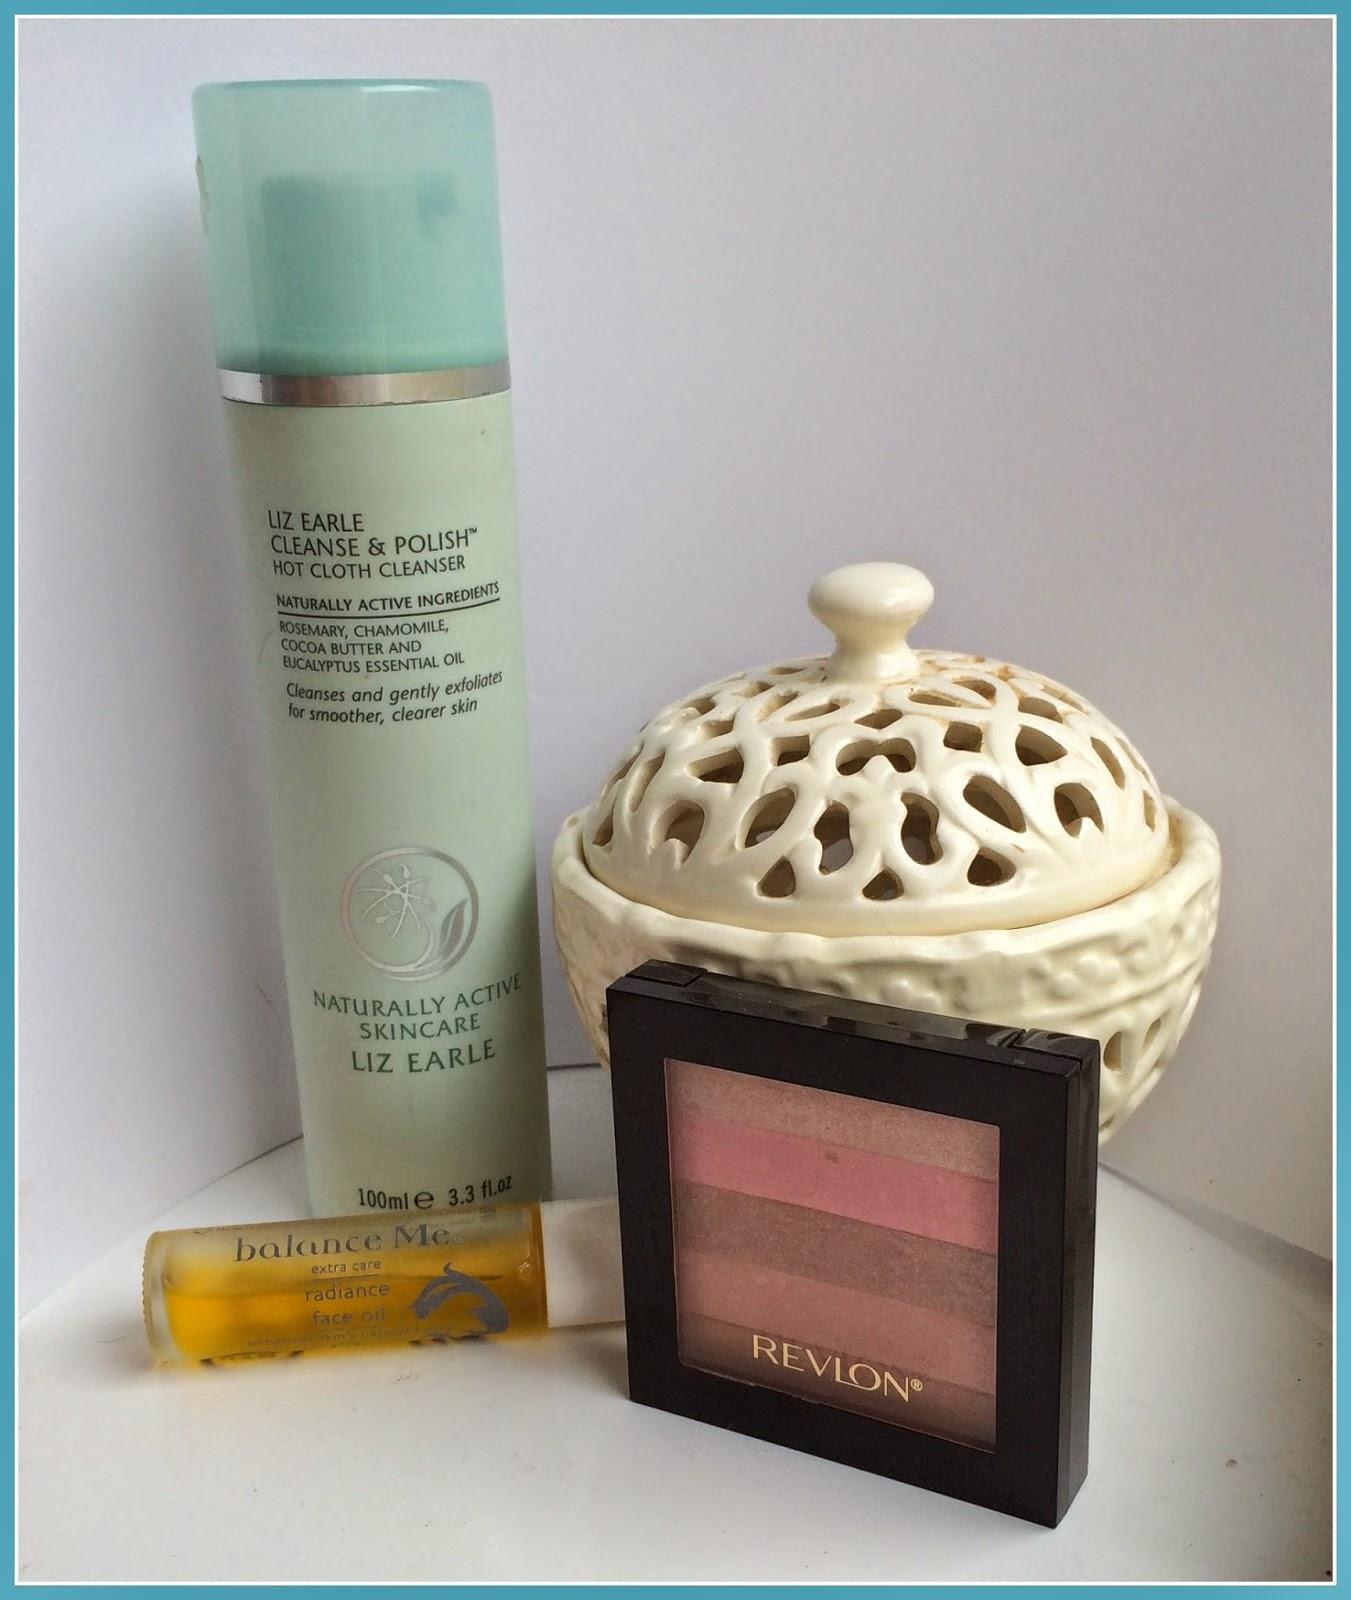 liz-earle-cleanse-and-polish-revlon-highligher-balance-me-facial-oil